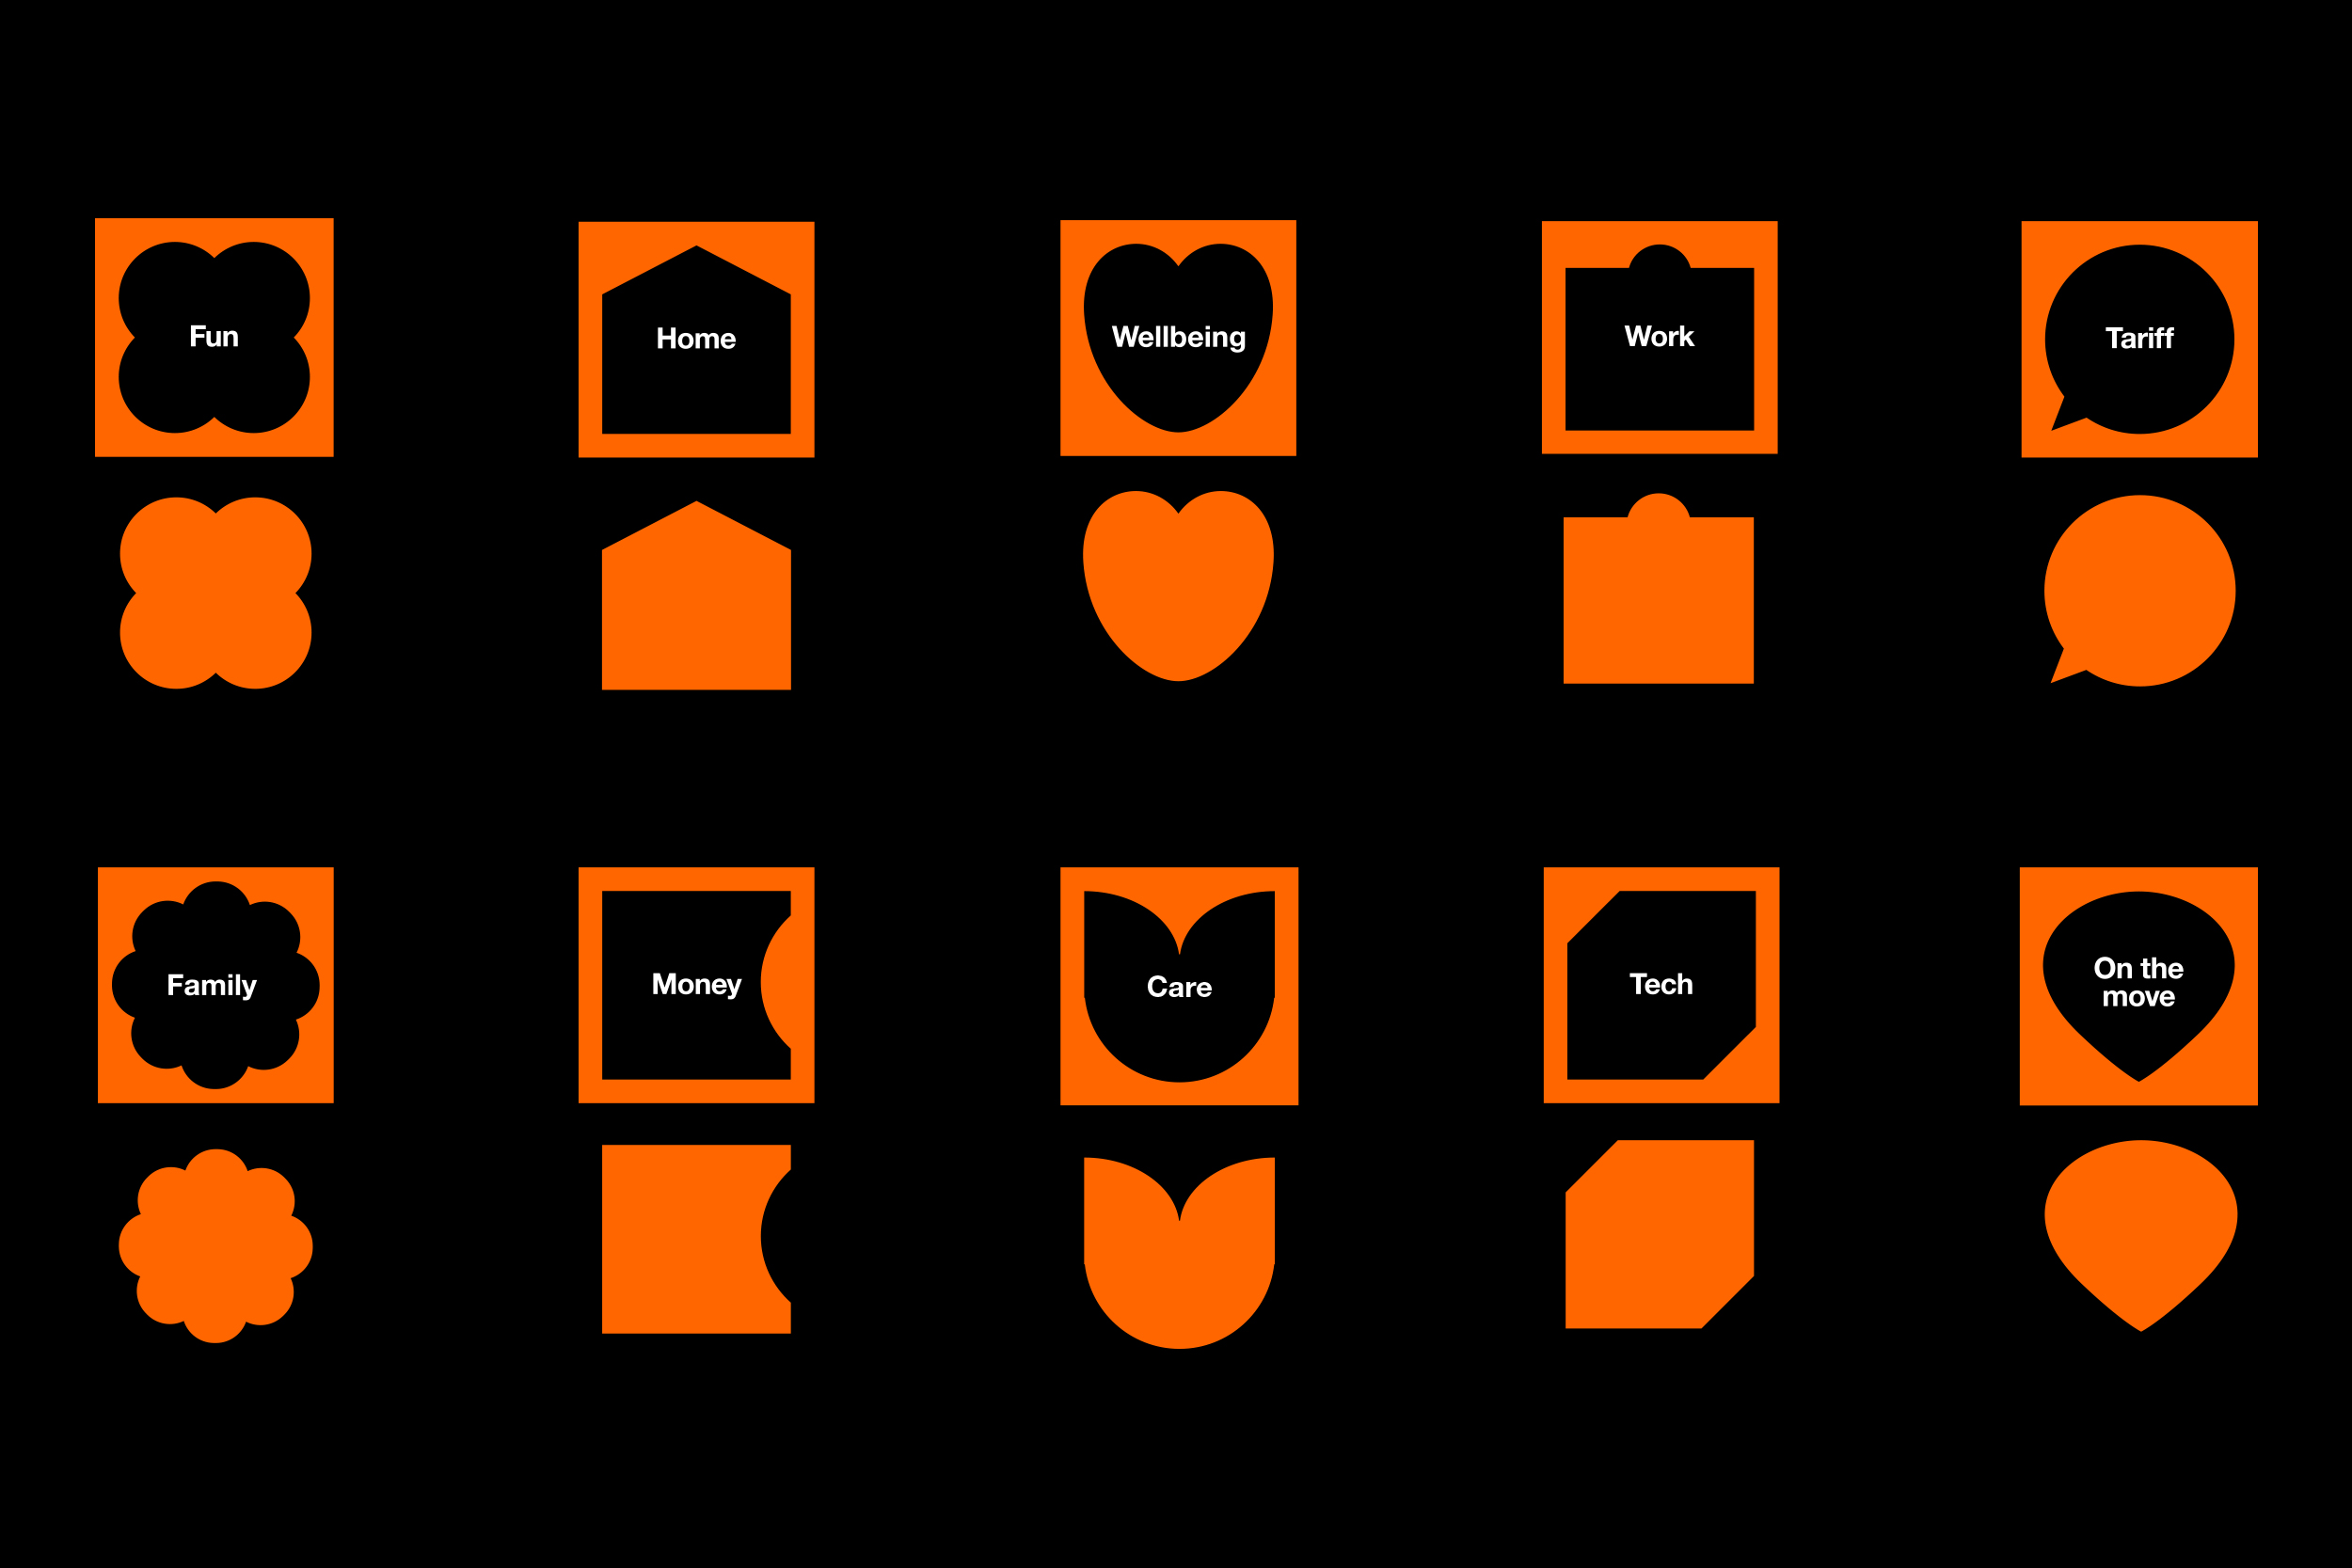 30_work_Orange-2014_72dpi_01_black.jpg